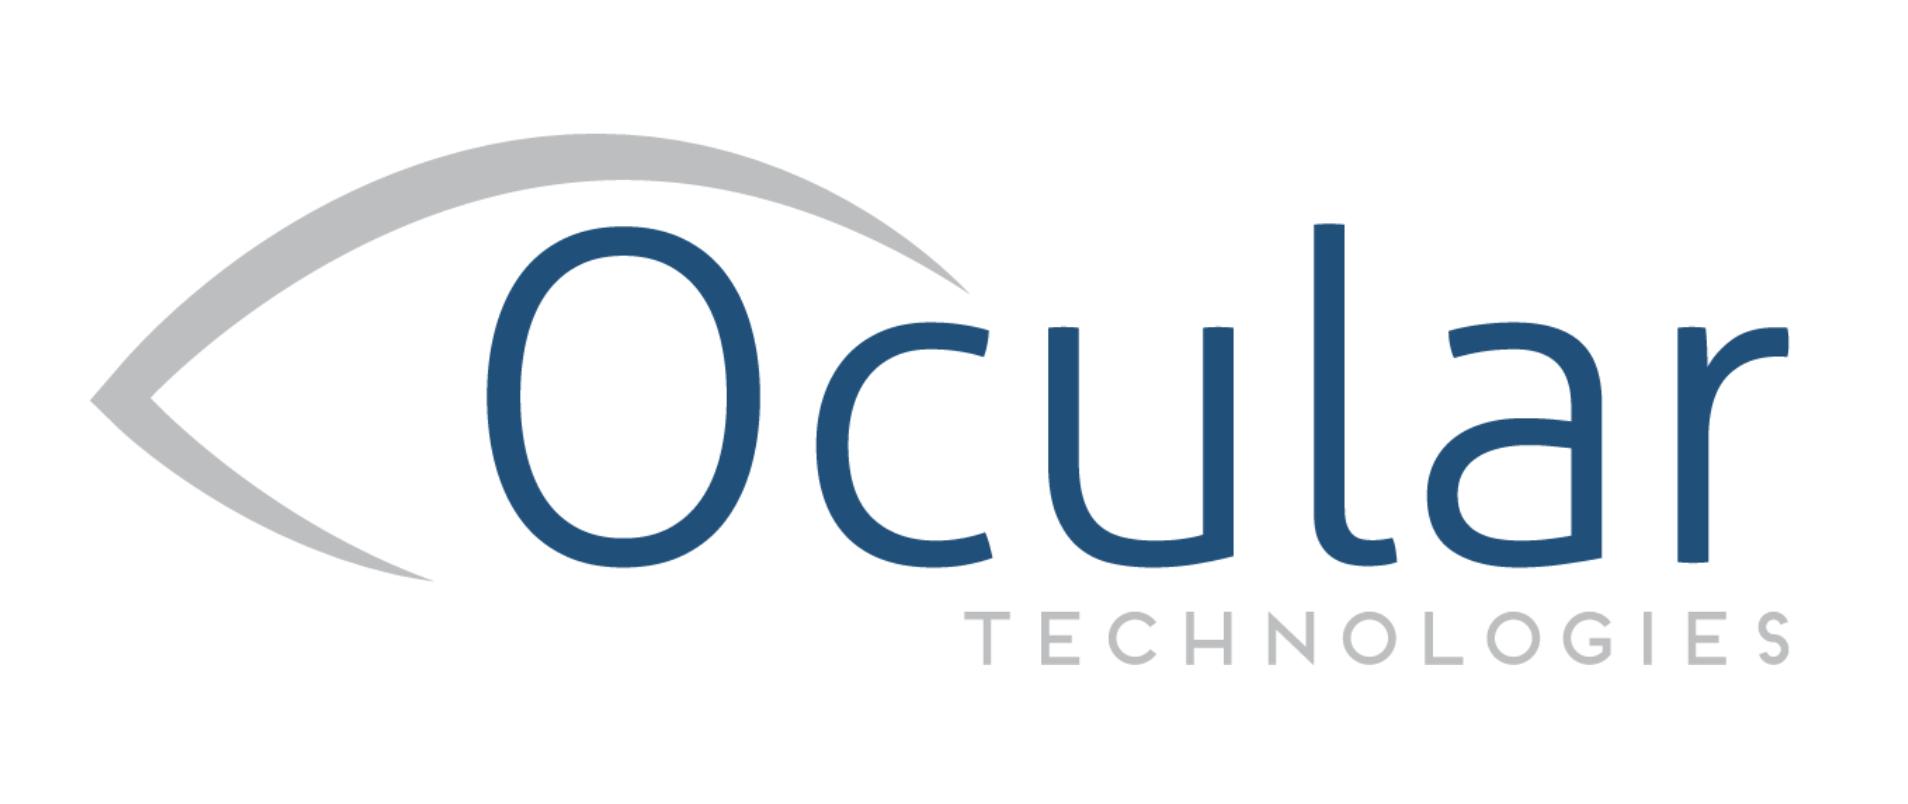 Ocular Technologies